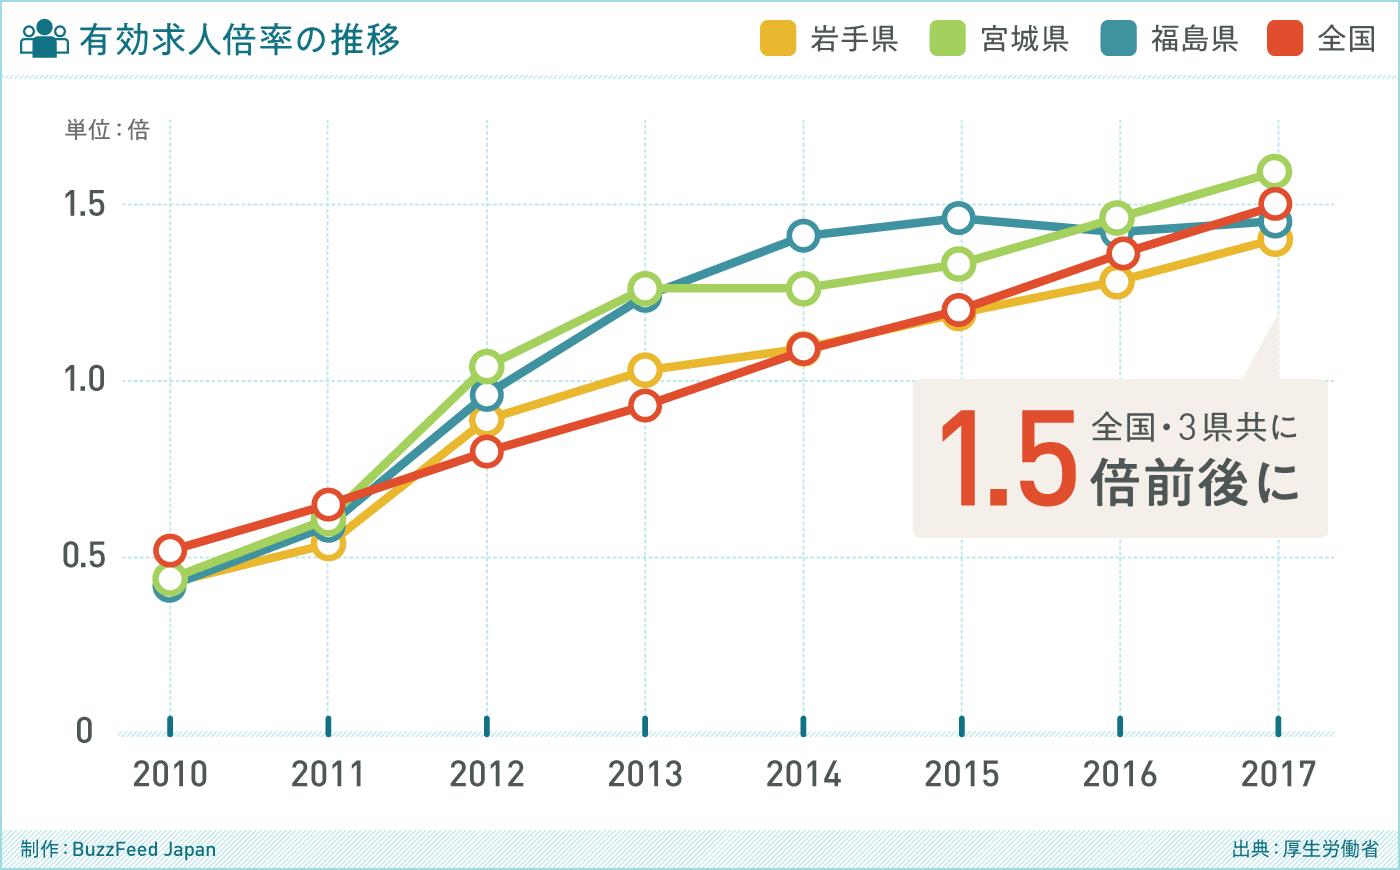 グラフ 有効求人倍率の推移(出典:環境省 / 福島県)